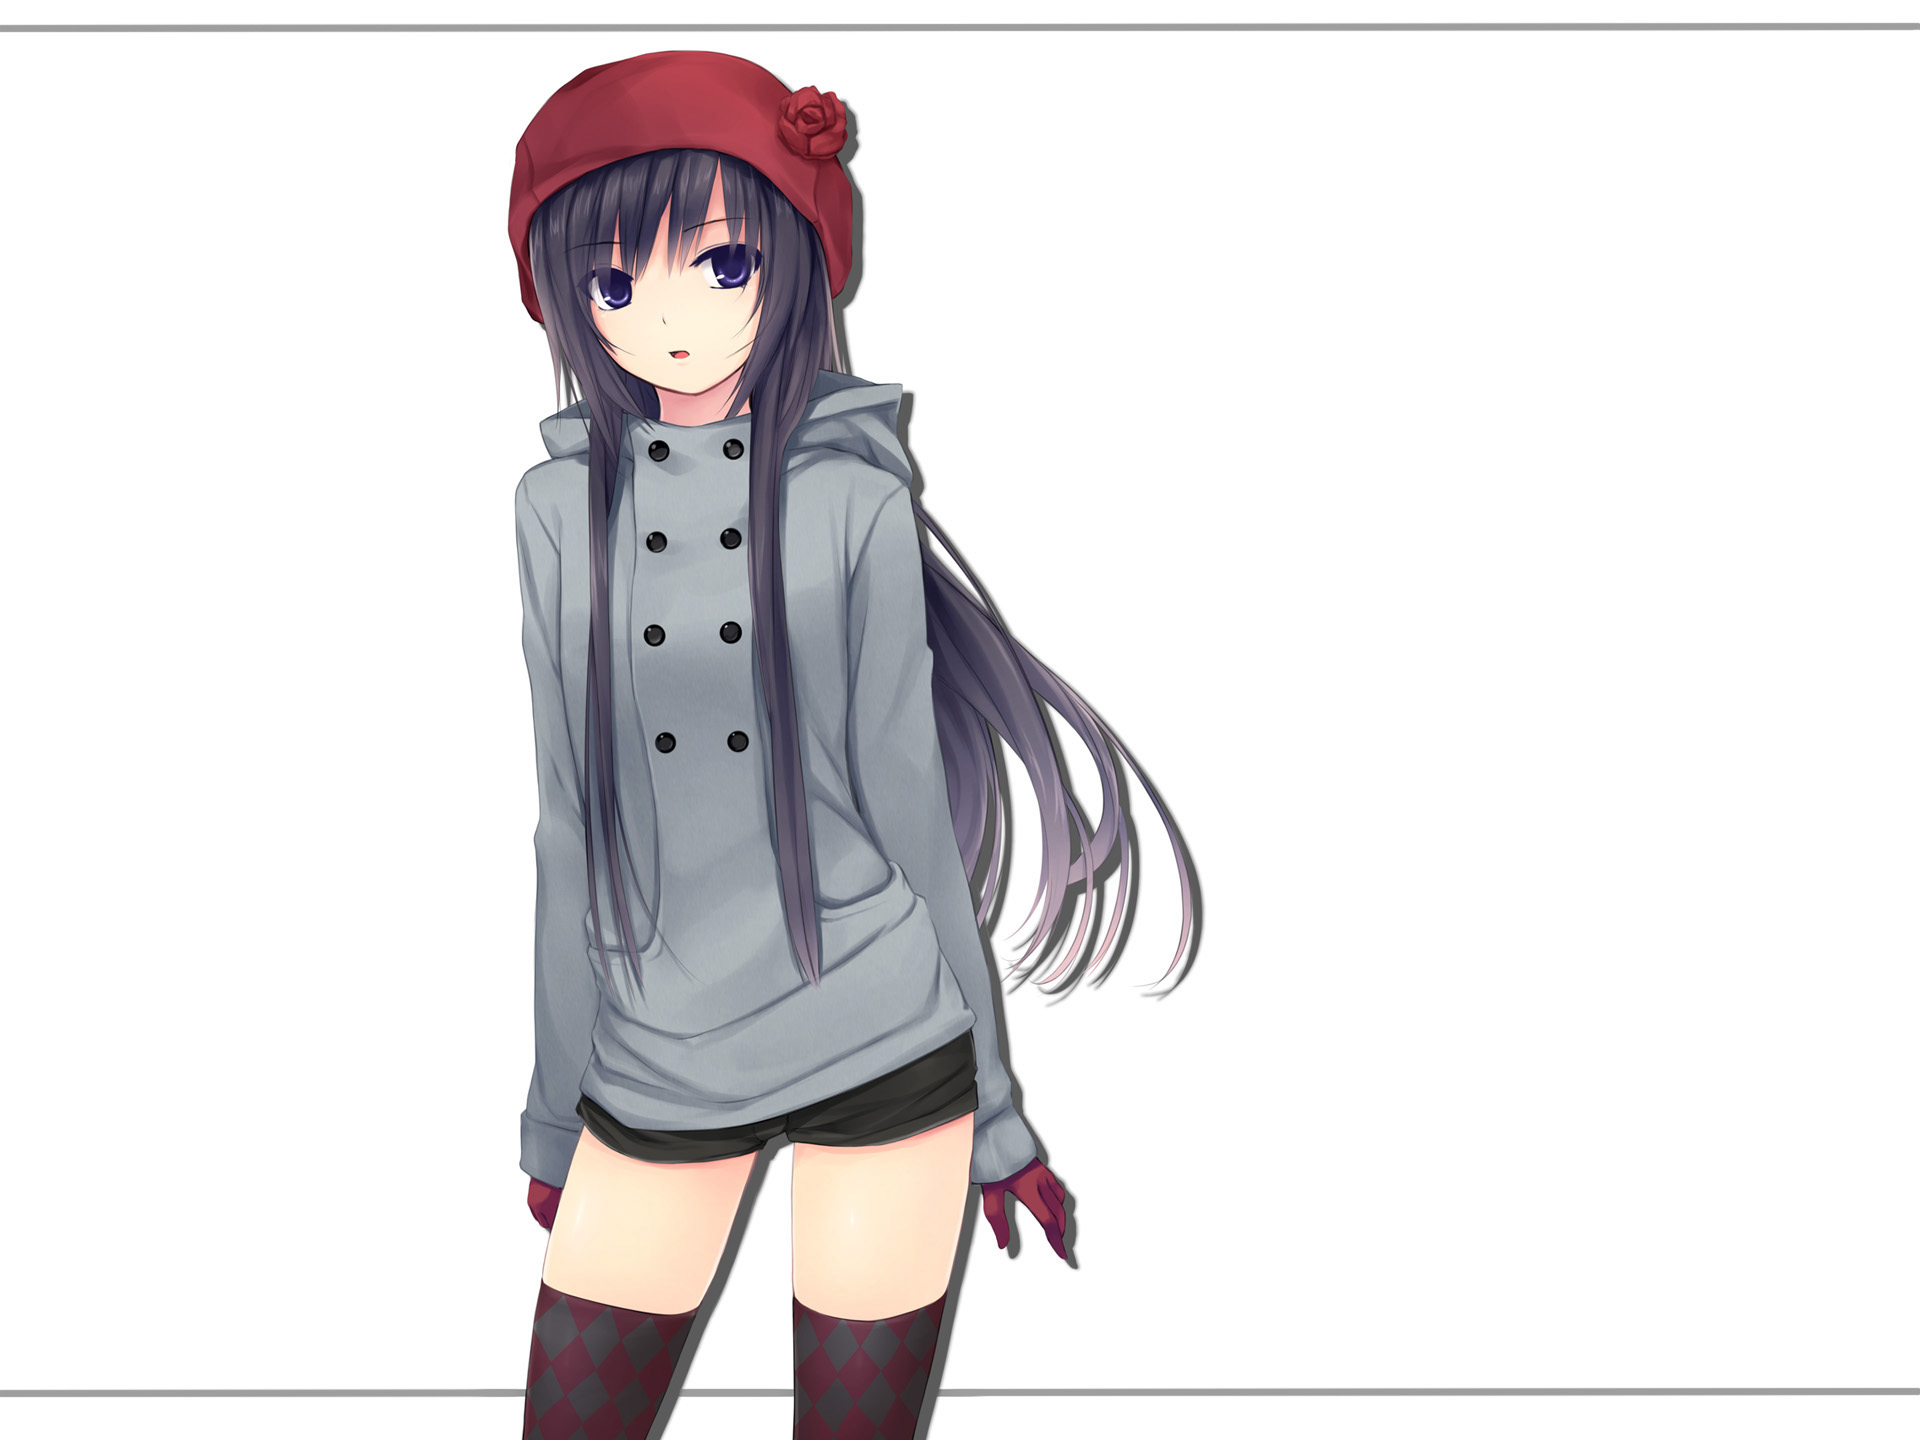 Black hair coffee-kizoku cure girl gloves hat long hair purple